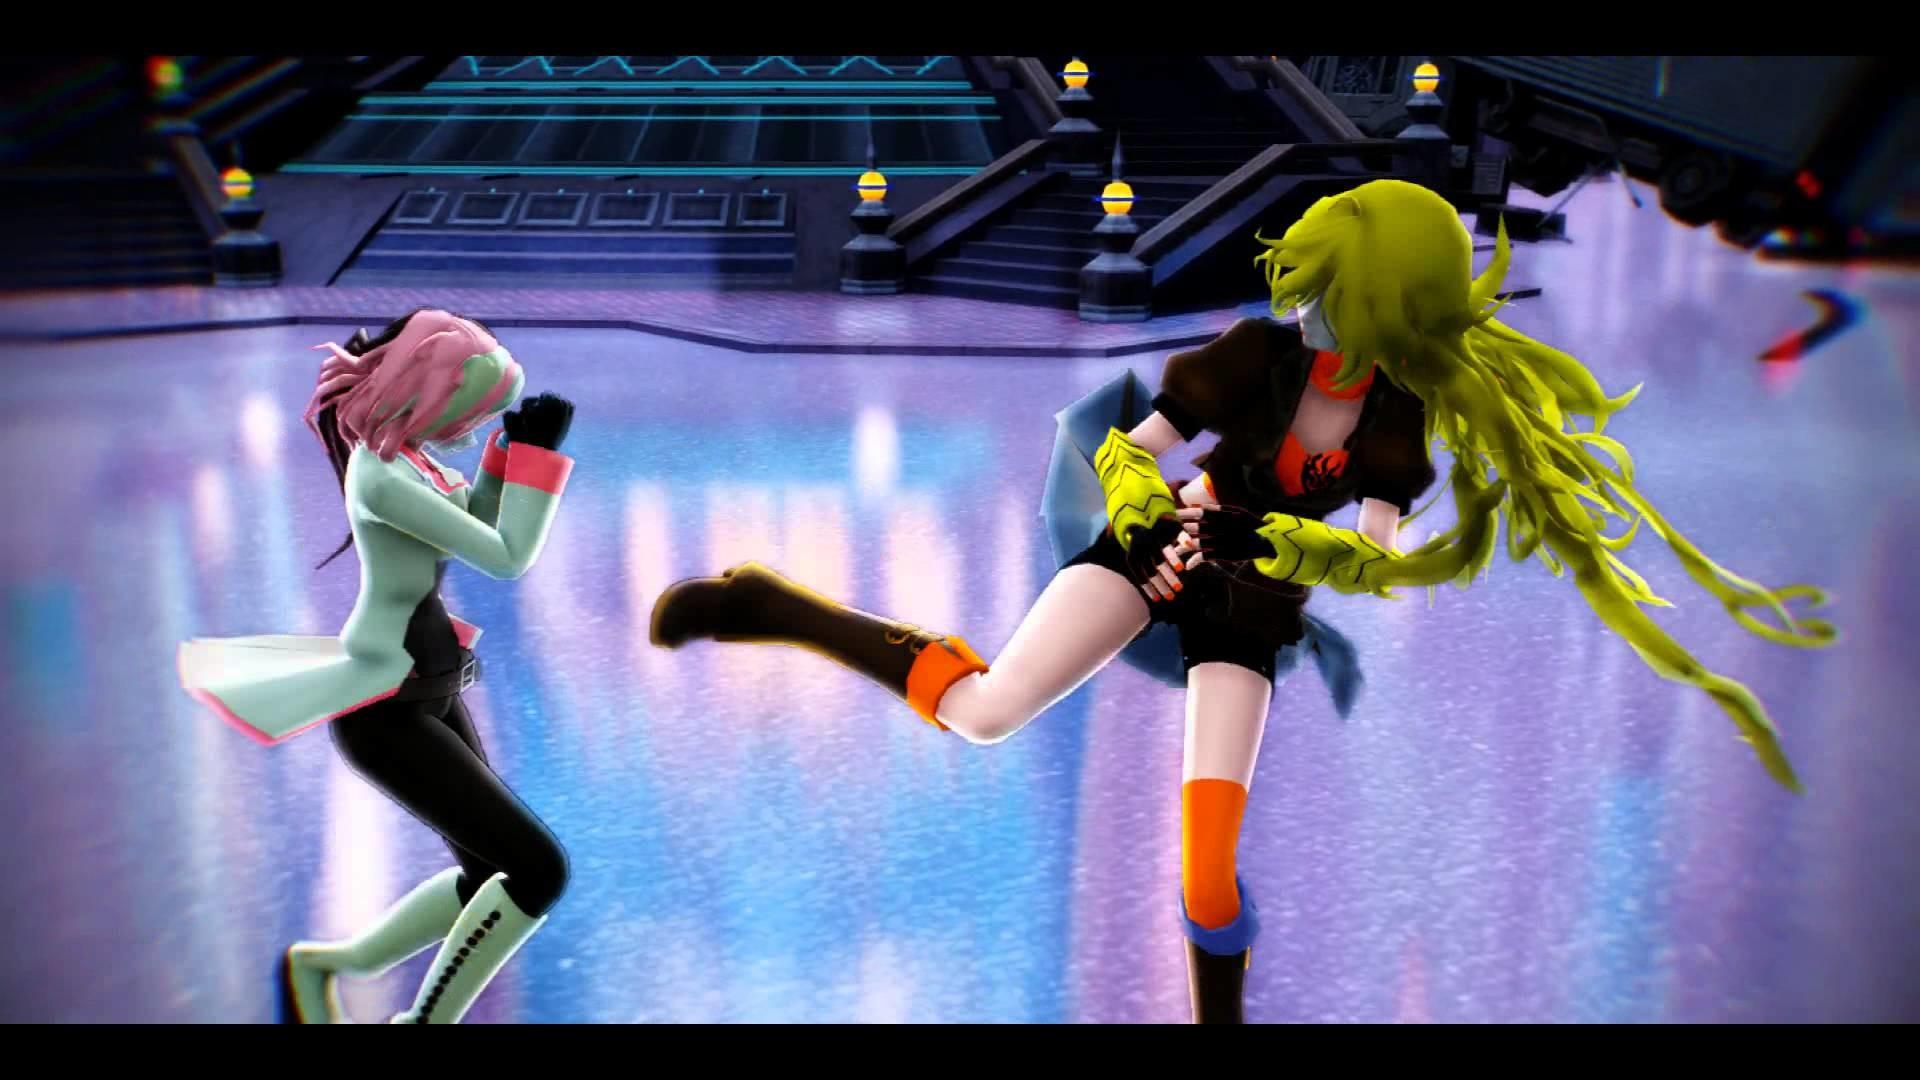 【MMD RWBY】Yang vs Neo (Short fight) – YouTube